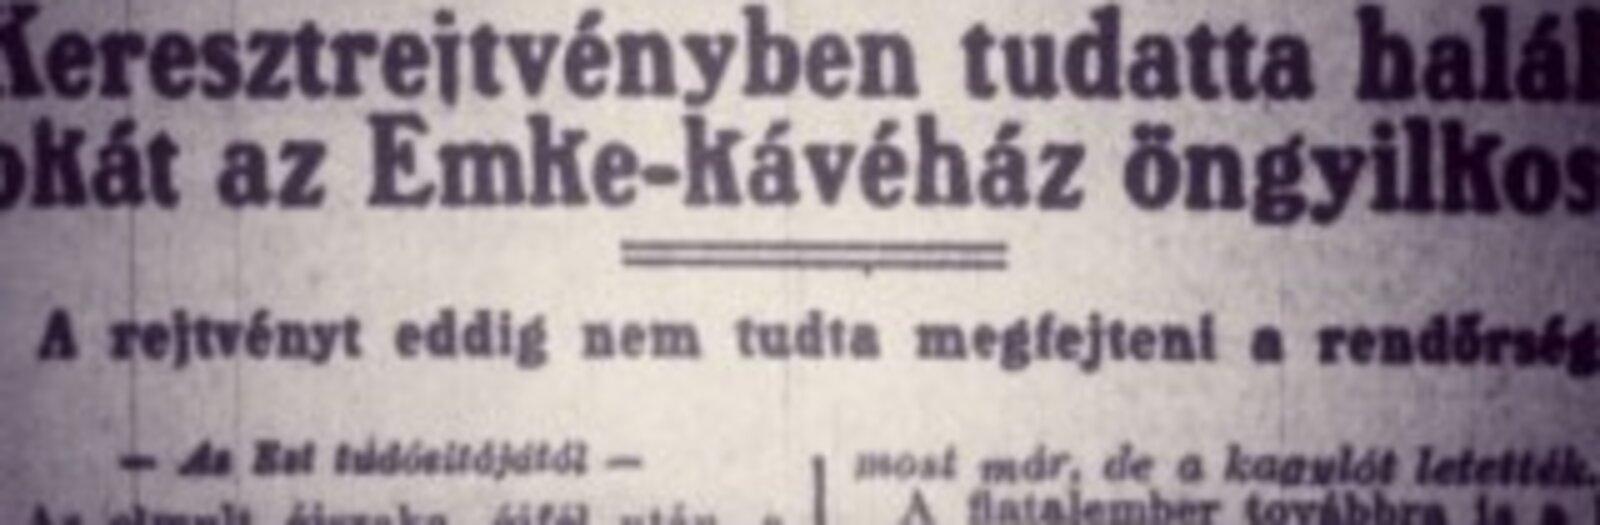 Igaz vagy hamis? - 7 városi legenda Budapestről